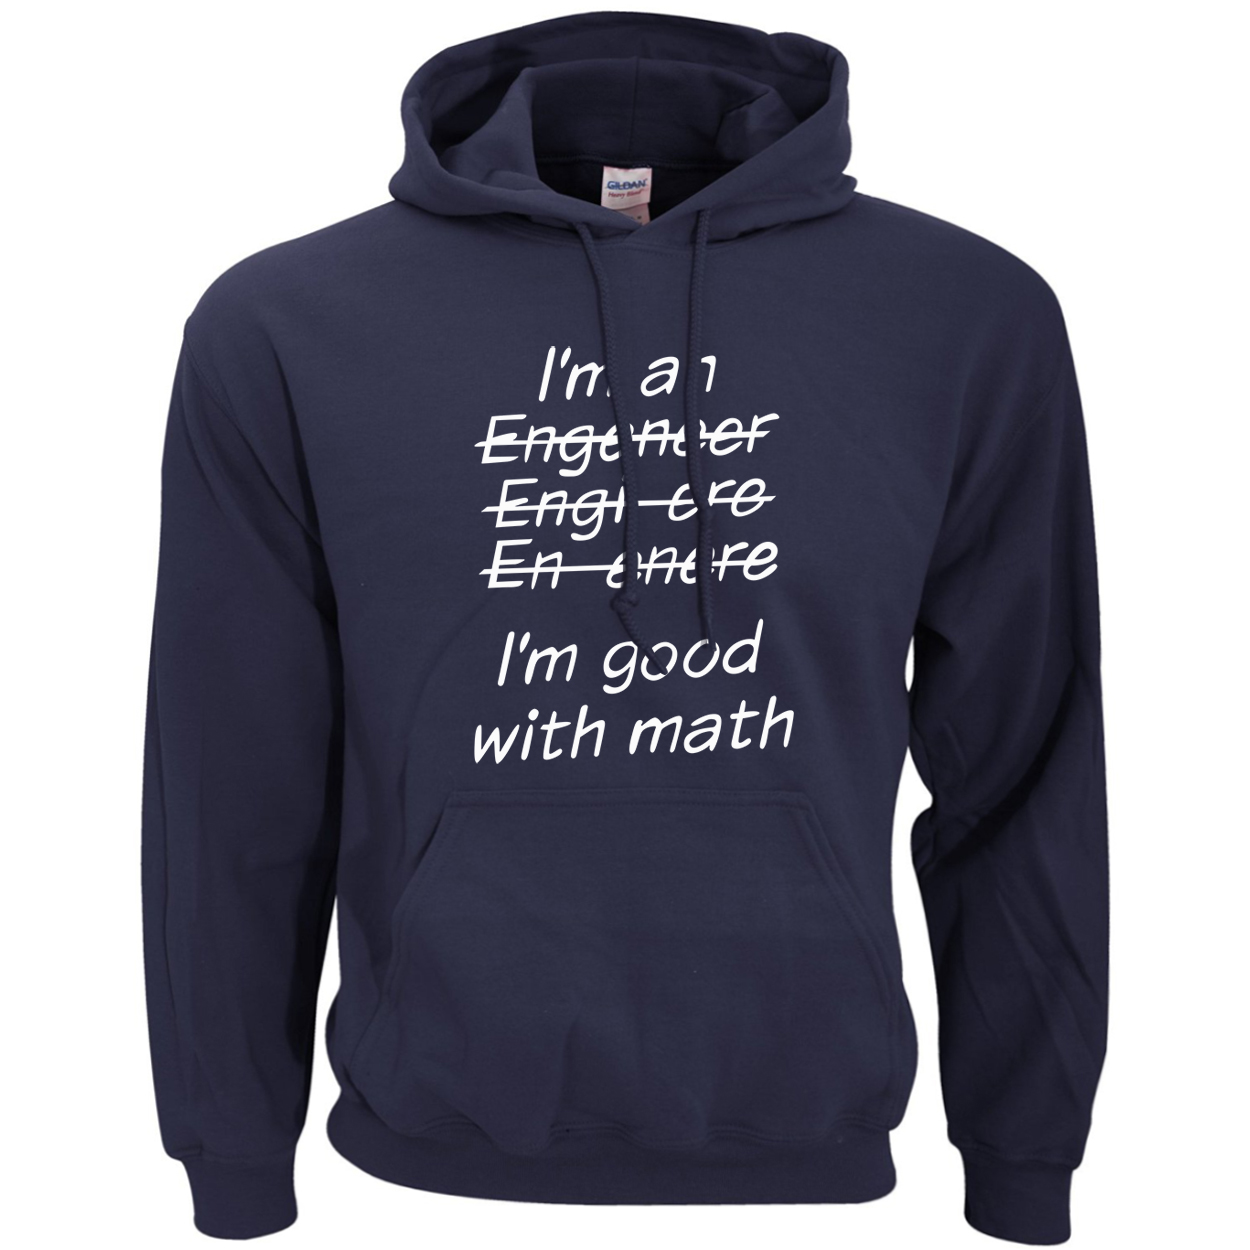 For Adult I Am An Engineer, I'm Good With Math Funny Clothing Brand Hoodies Men 2019 Autumn Winter Warm Fleece Men's Sweatshirts